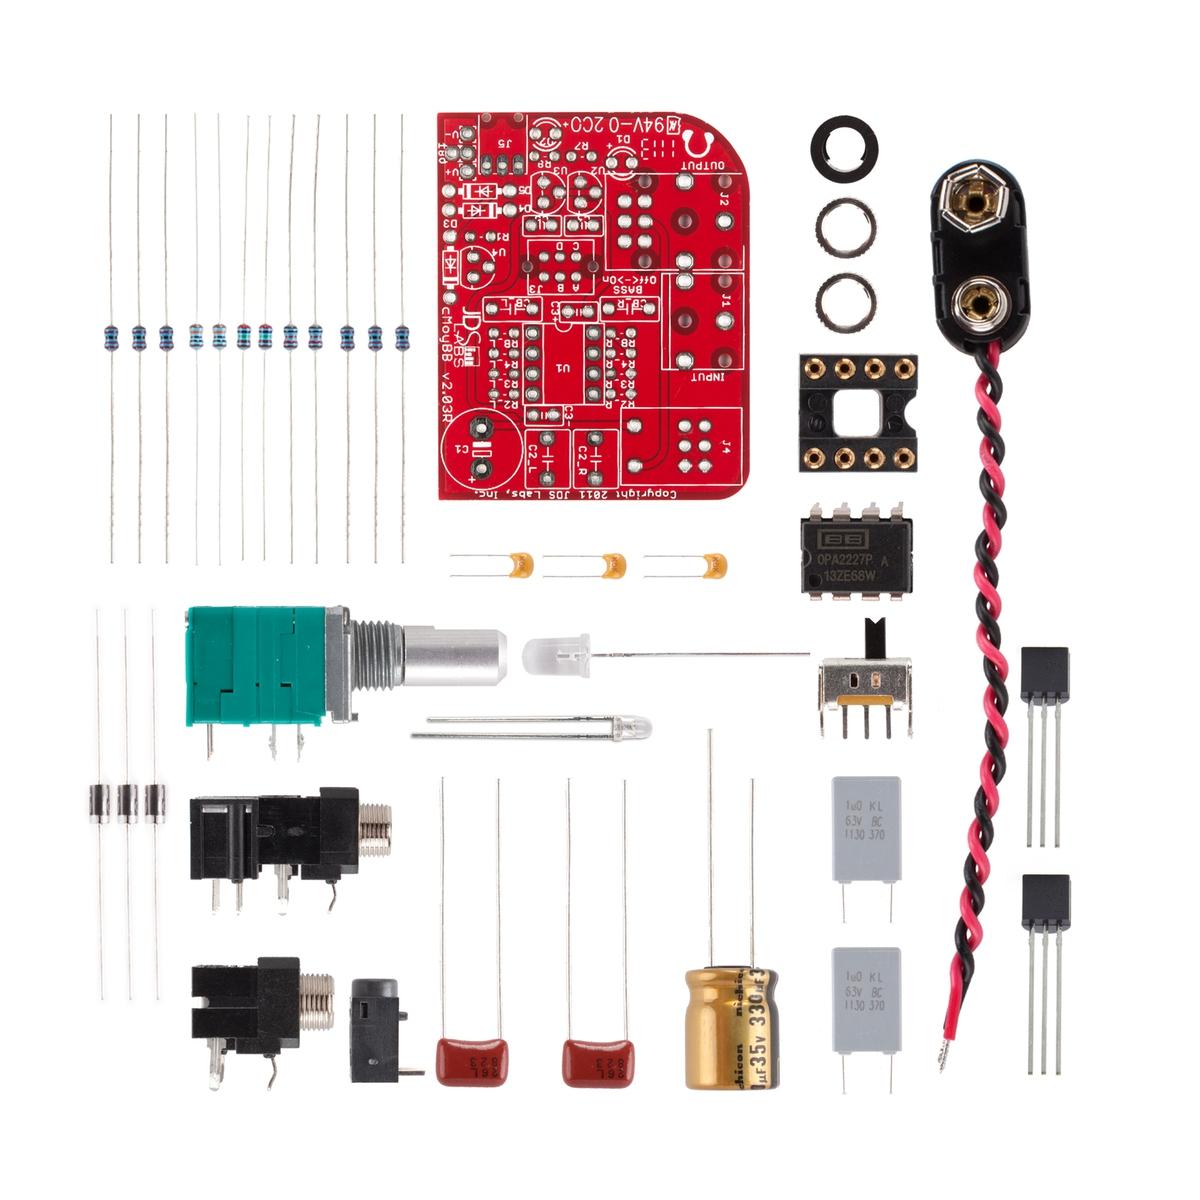 JDS Labs - cMoyBB DIY Kit, Rechargeable - DIY Kits